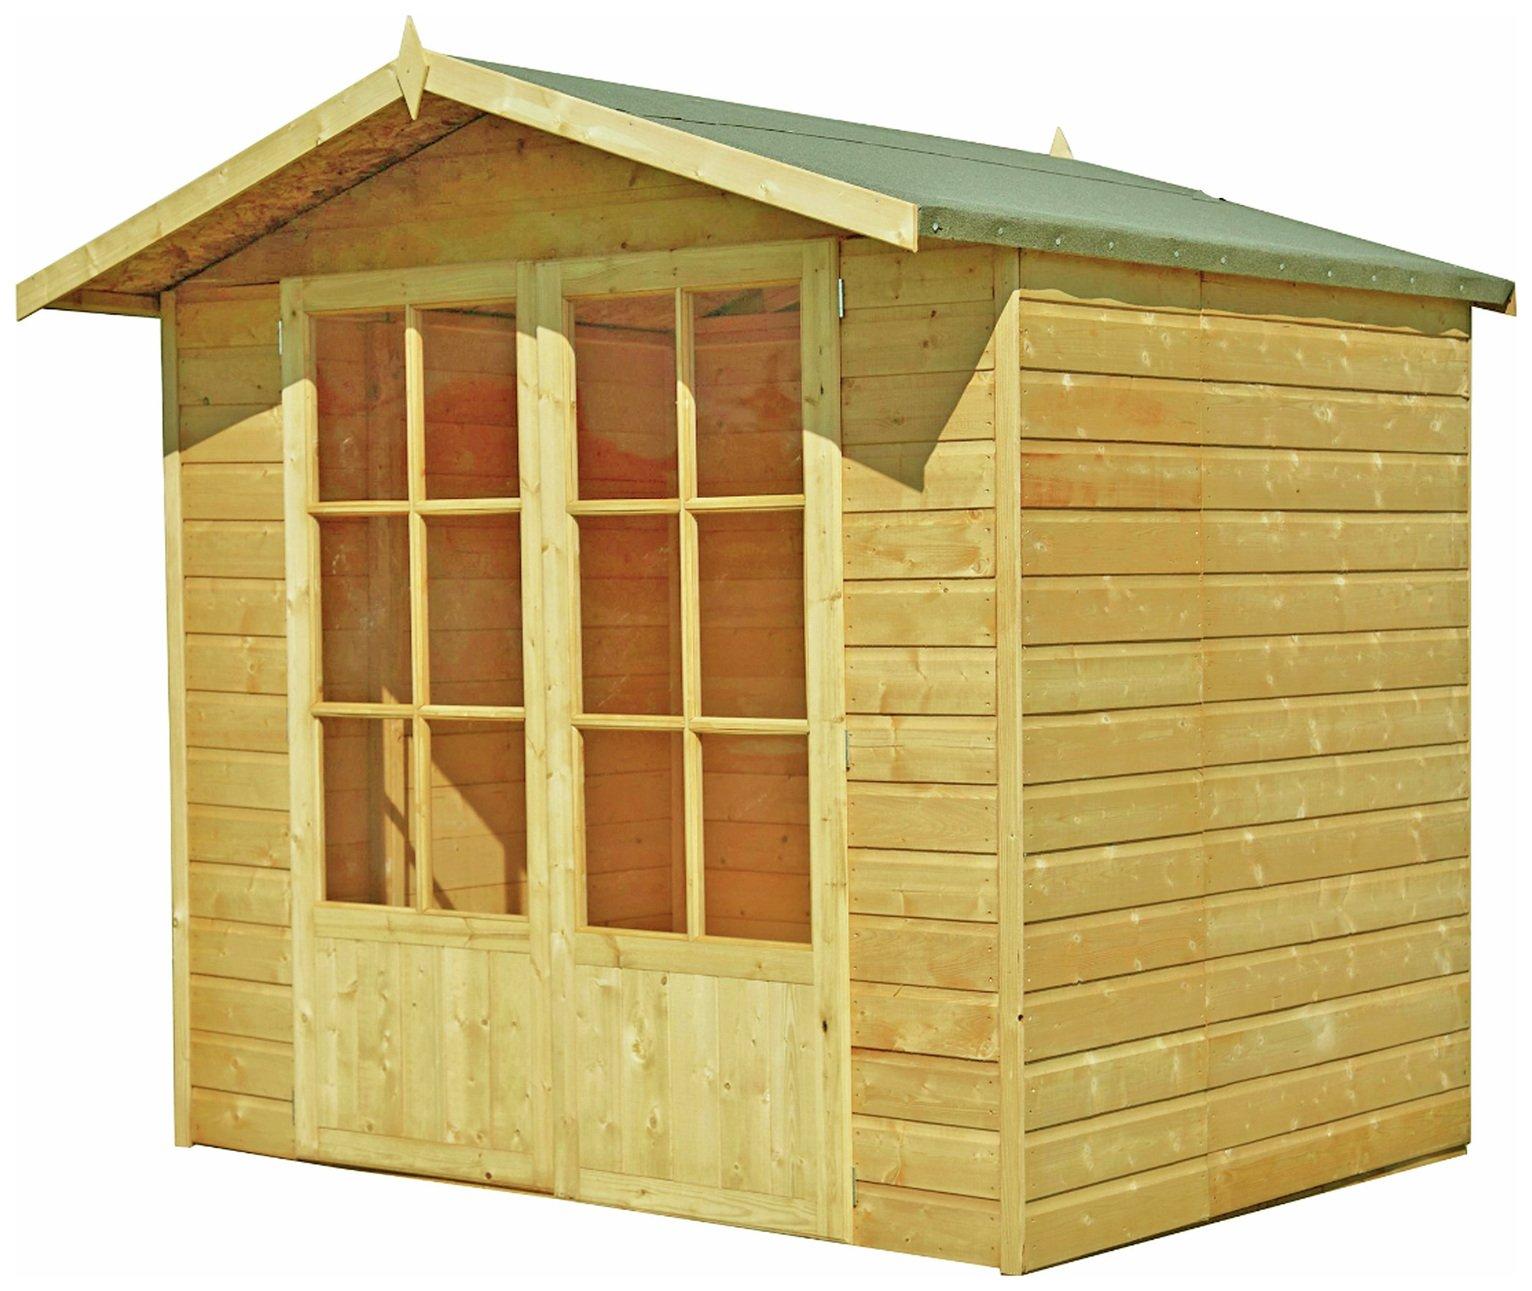 Image of Homewood Lumley Summerhouse 7 x 5ft